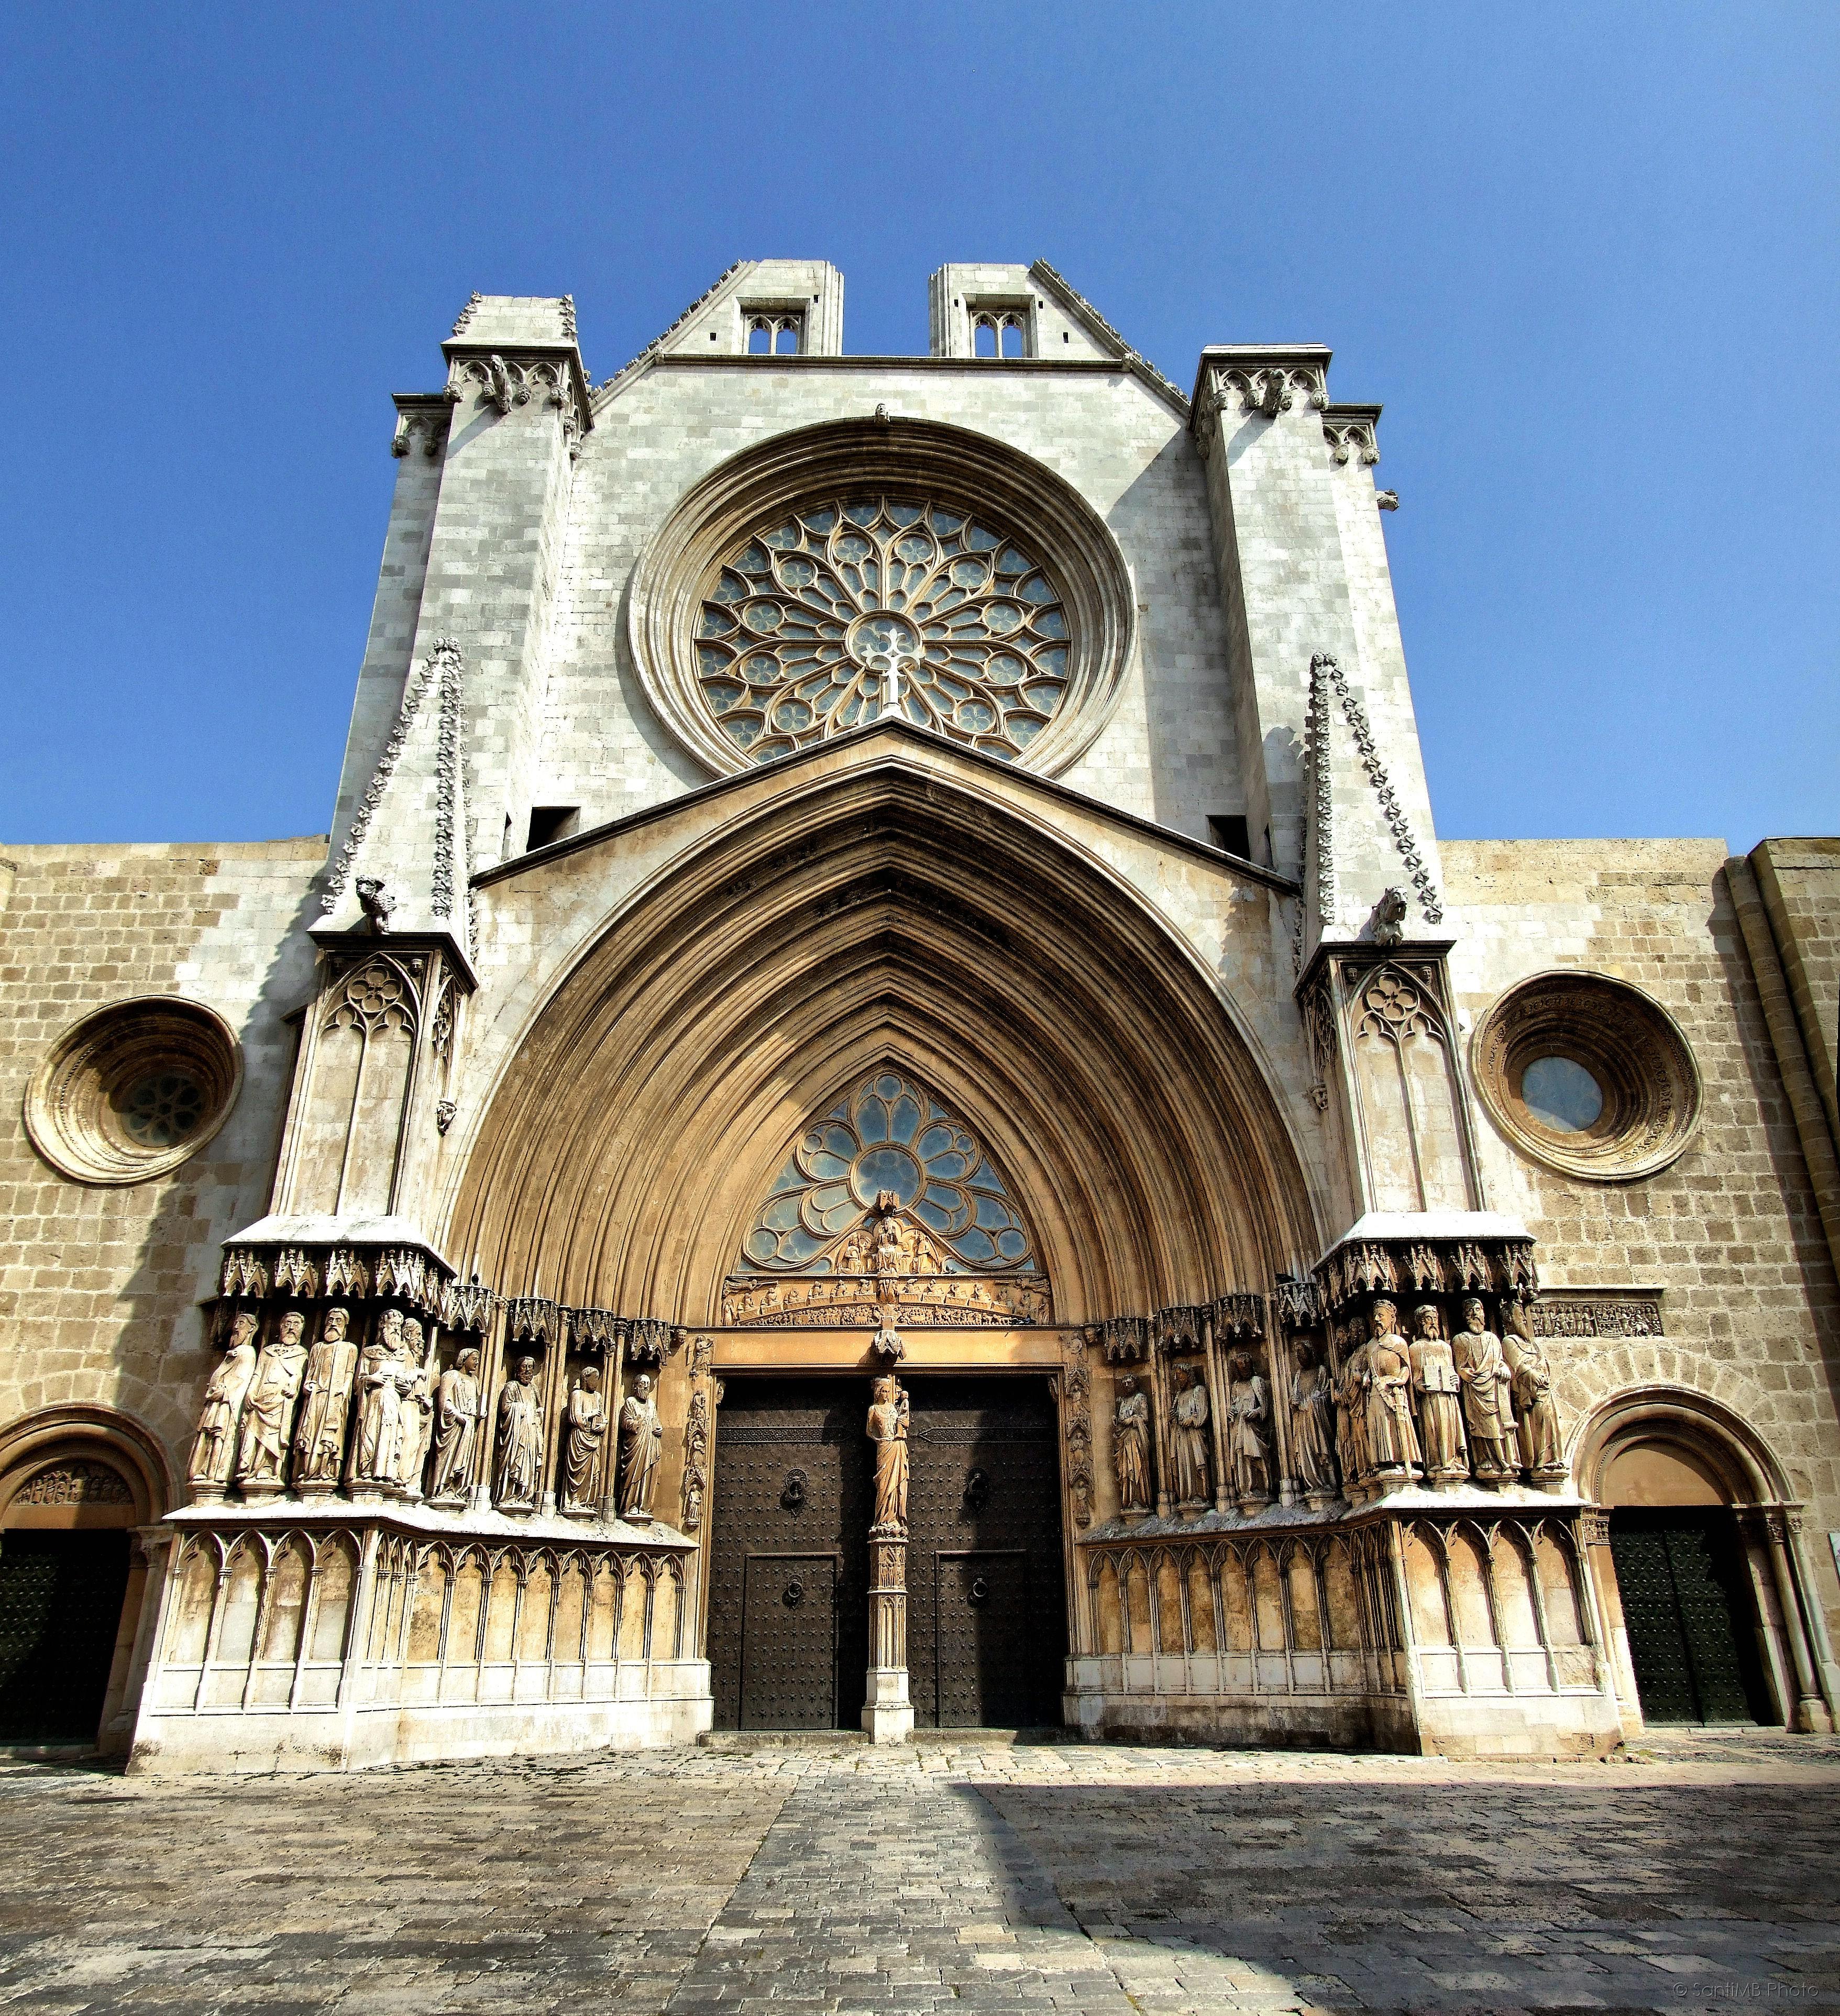 File:Catedral de Santa Maria (Tarragona) - 38.jpg